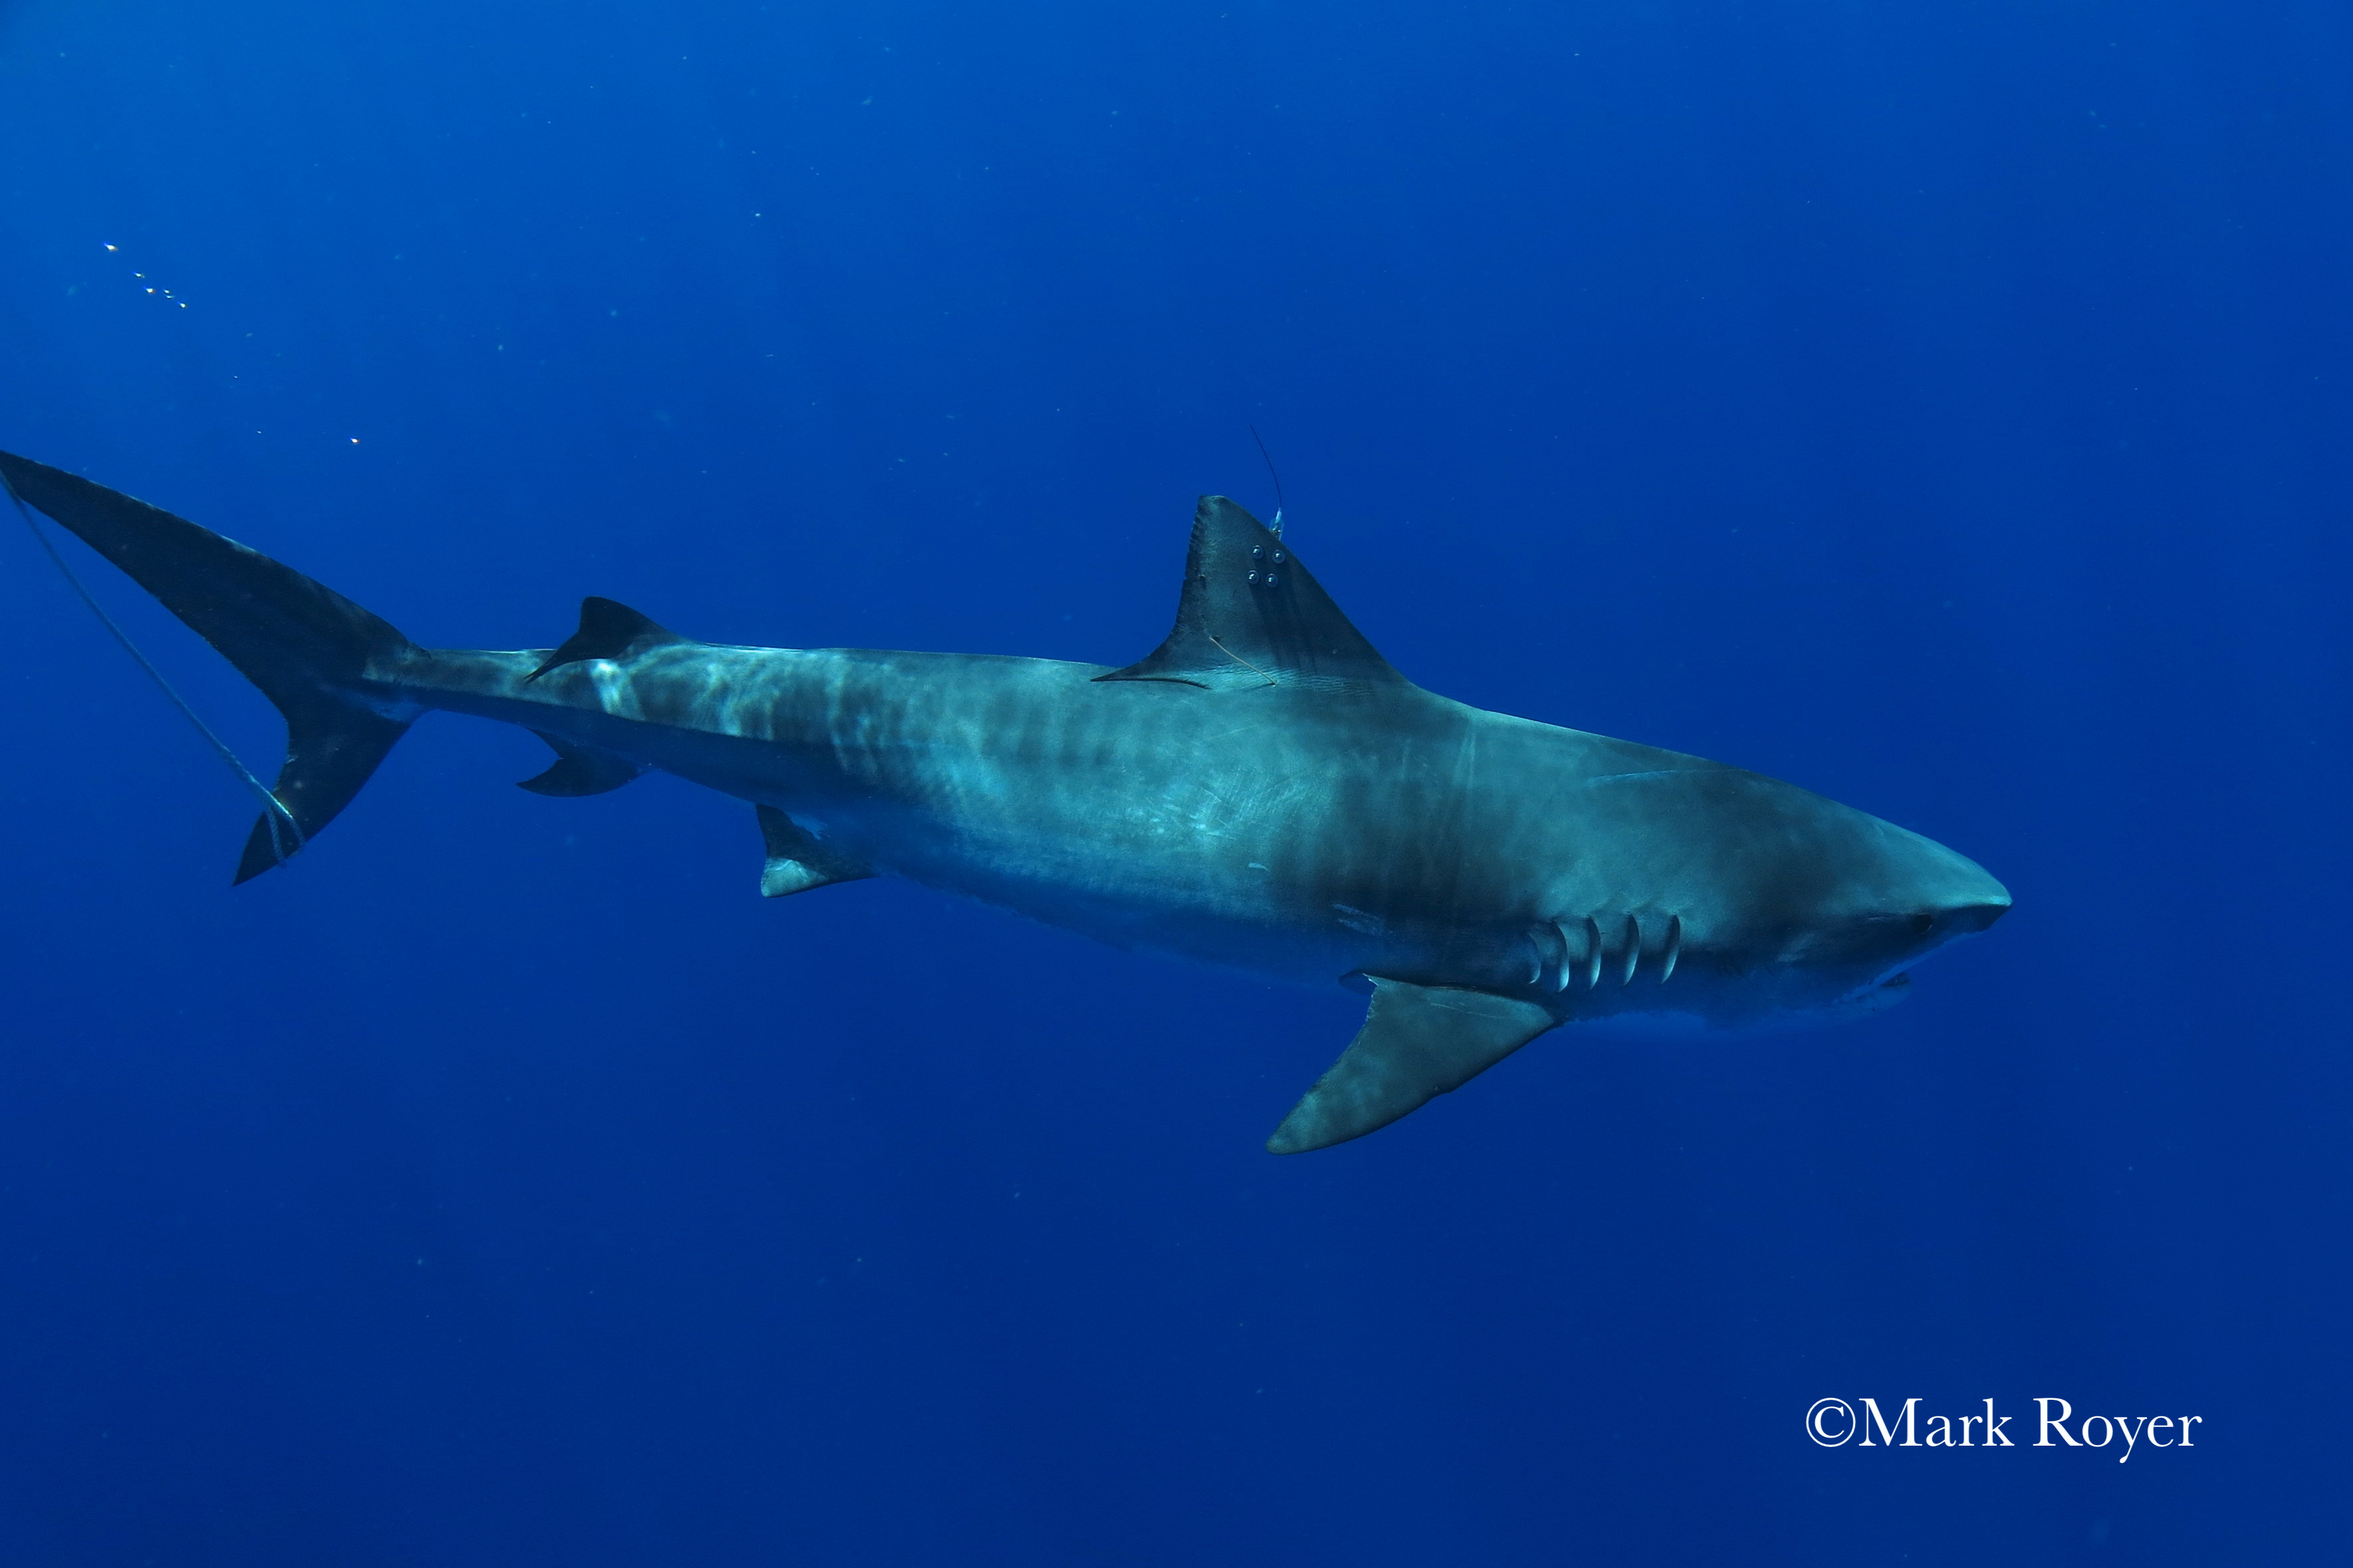 HQ Tiger Shark Wallpapers | File 3059.06Kb